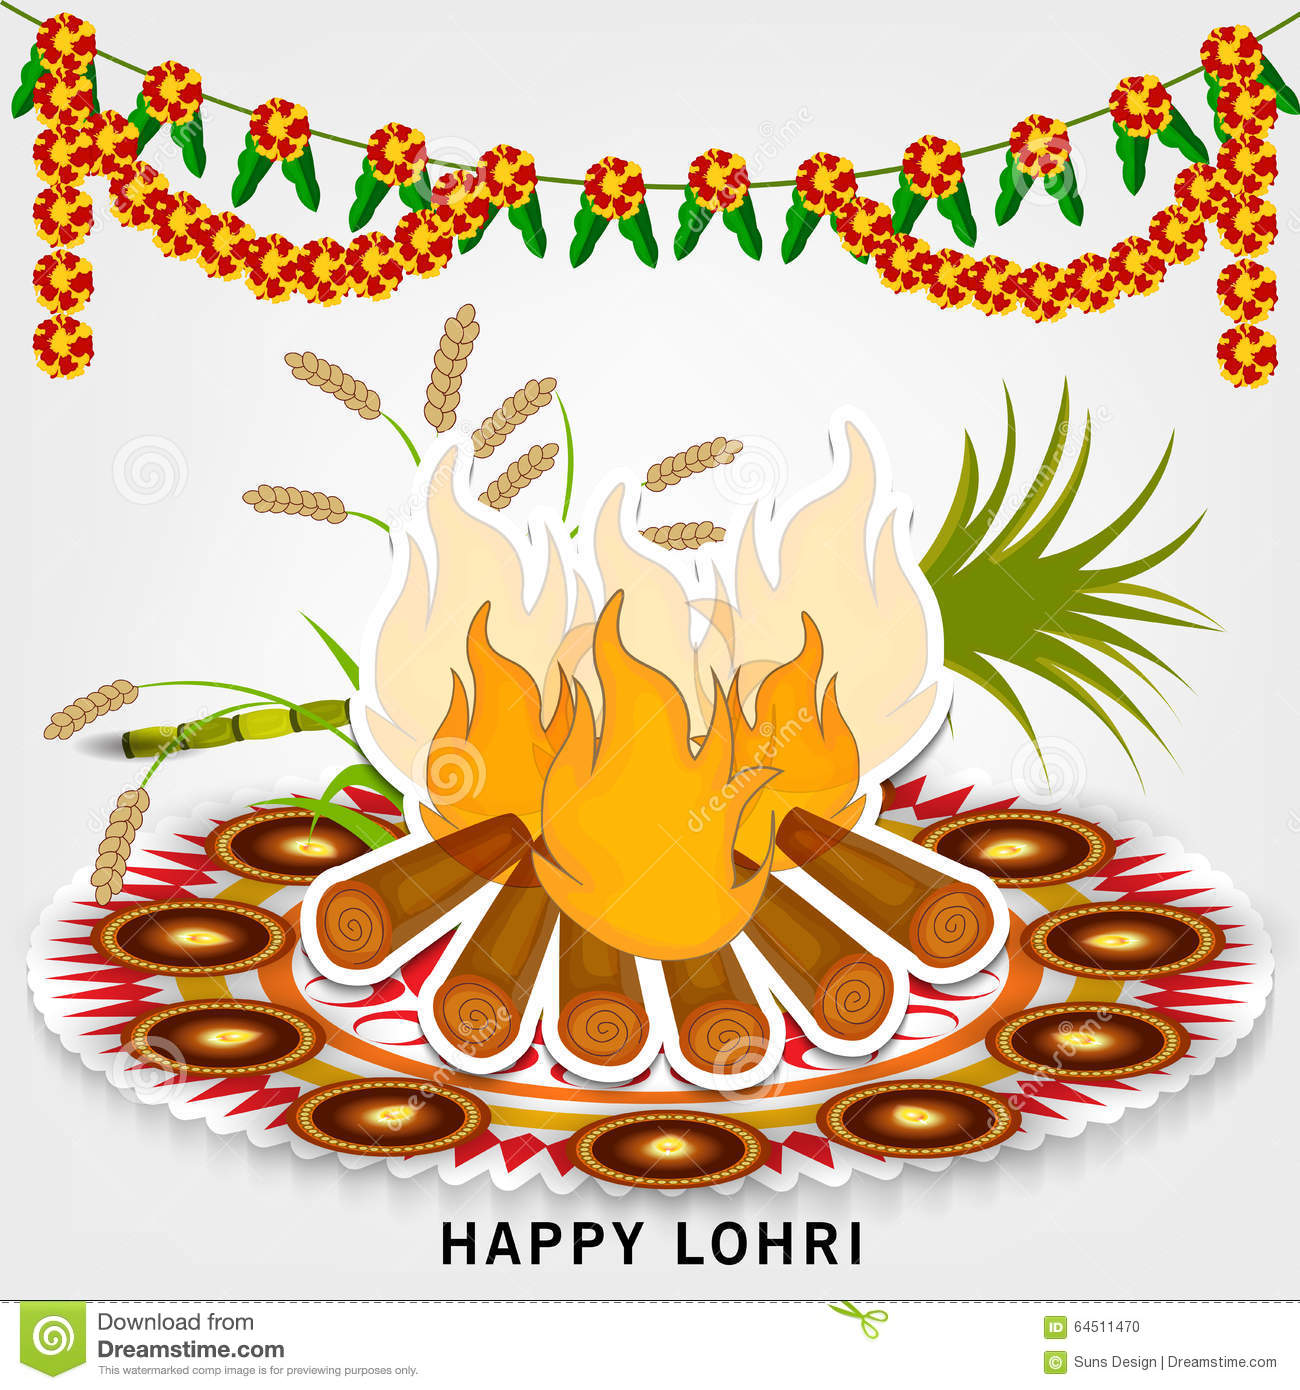 Lohri clipart jpg black and white stock Lohri clipart 8 » Clipart Station jpg black and white stock